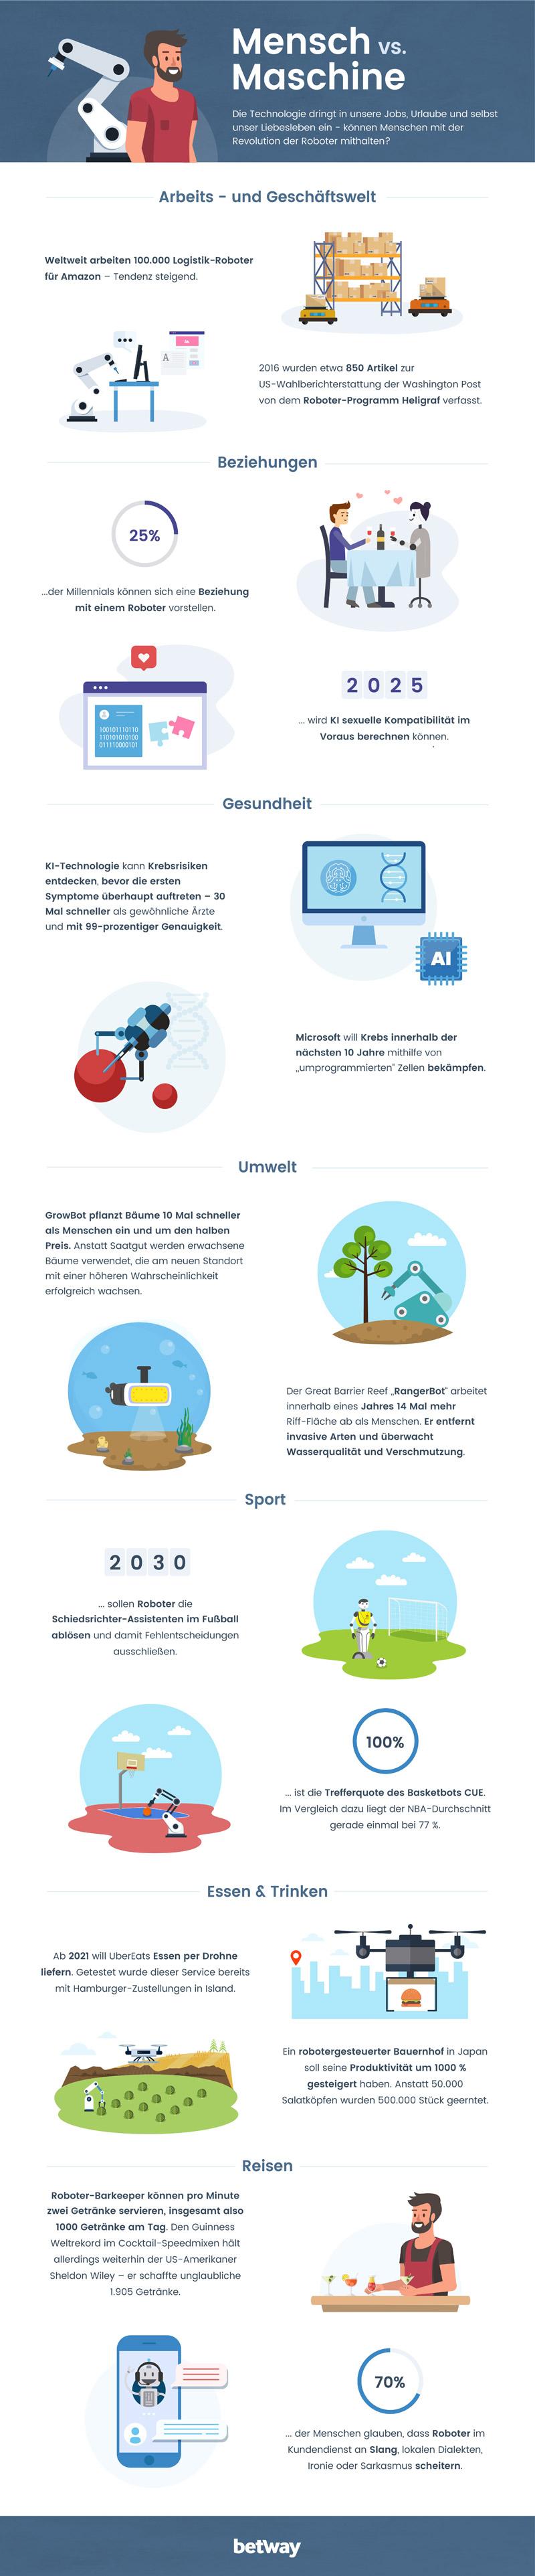 Infografik KI Roboter (Bild: Betway)